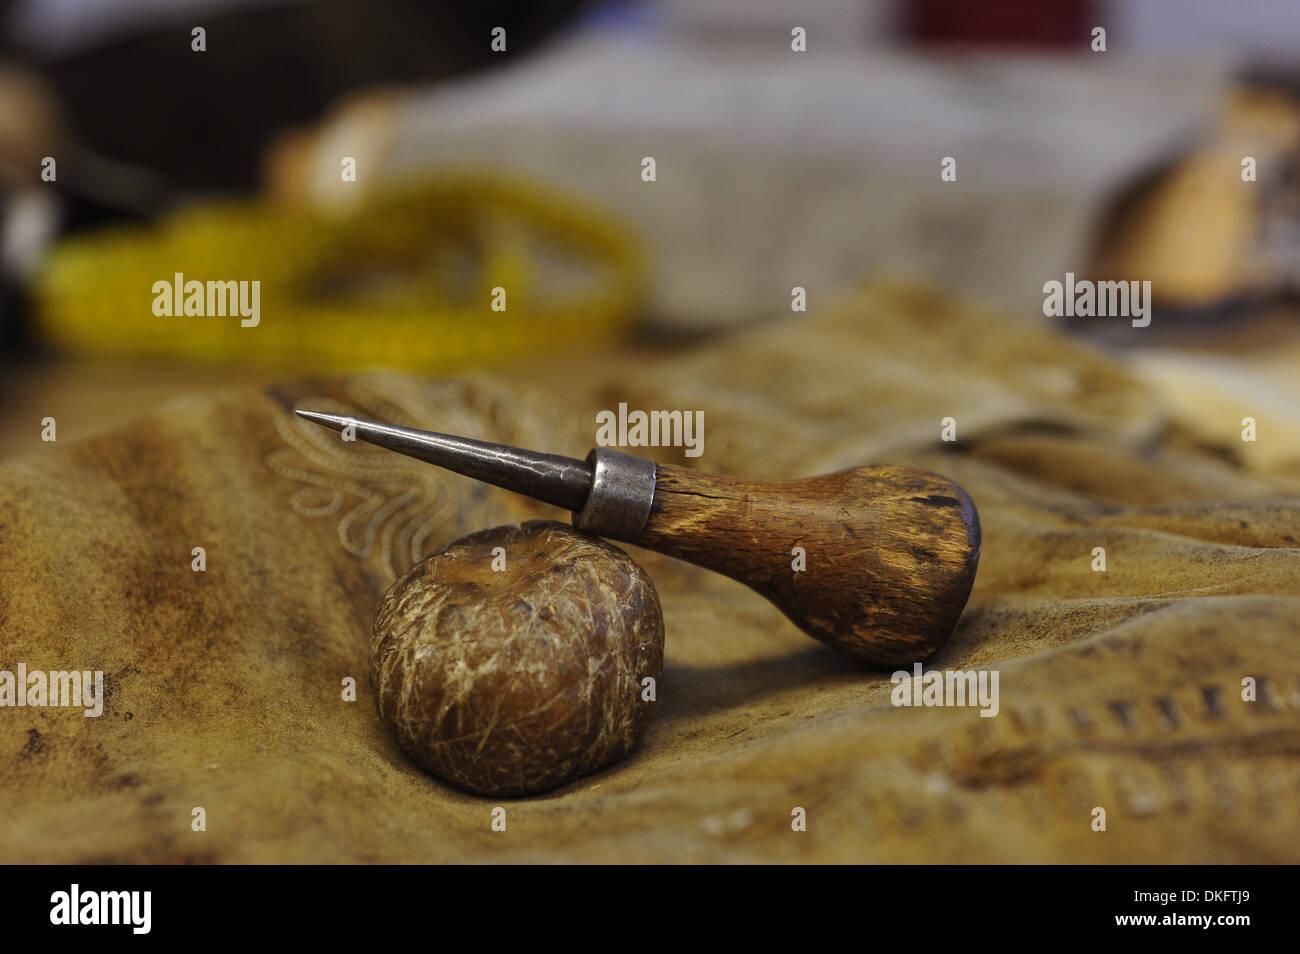 Manufacturing of a lederhosen in a workshop - Stock Image